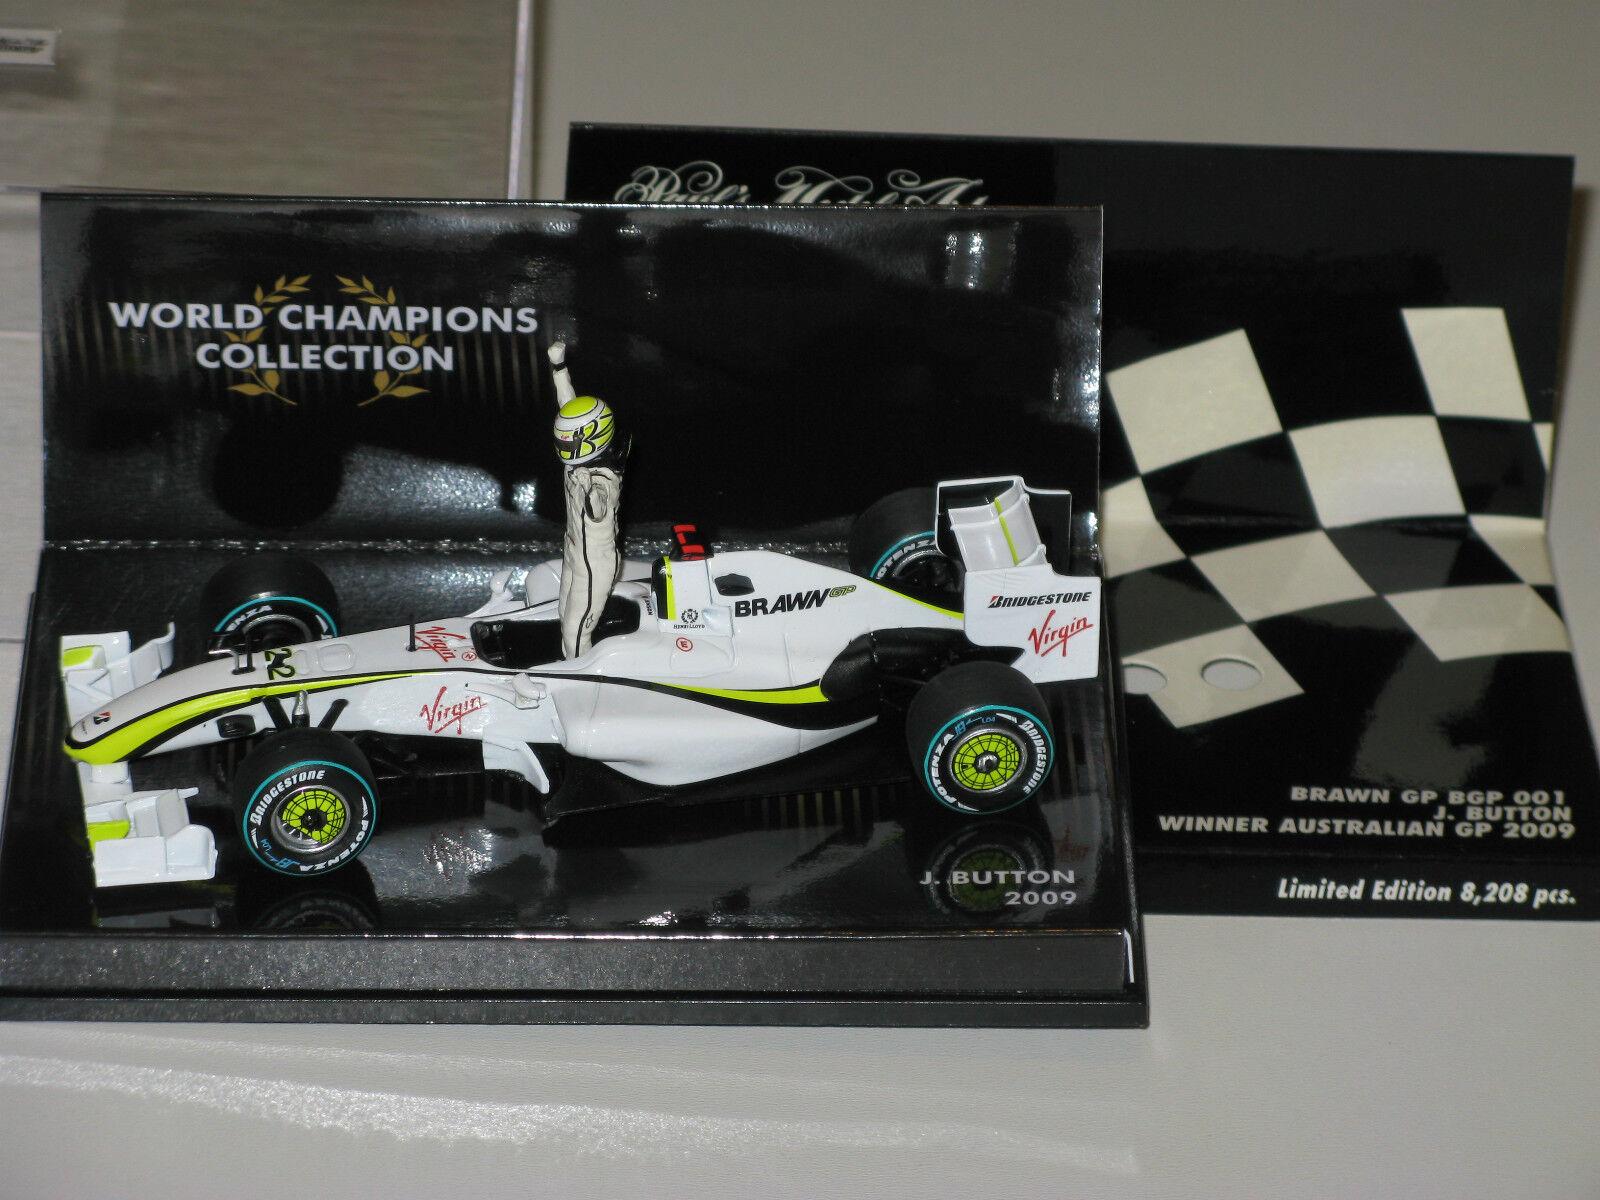 Brawn GP001 - World Champions Champions Champions 2009 - J. Button - F1 1 43 minichamps 1b8425